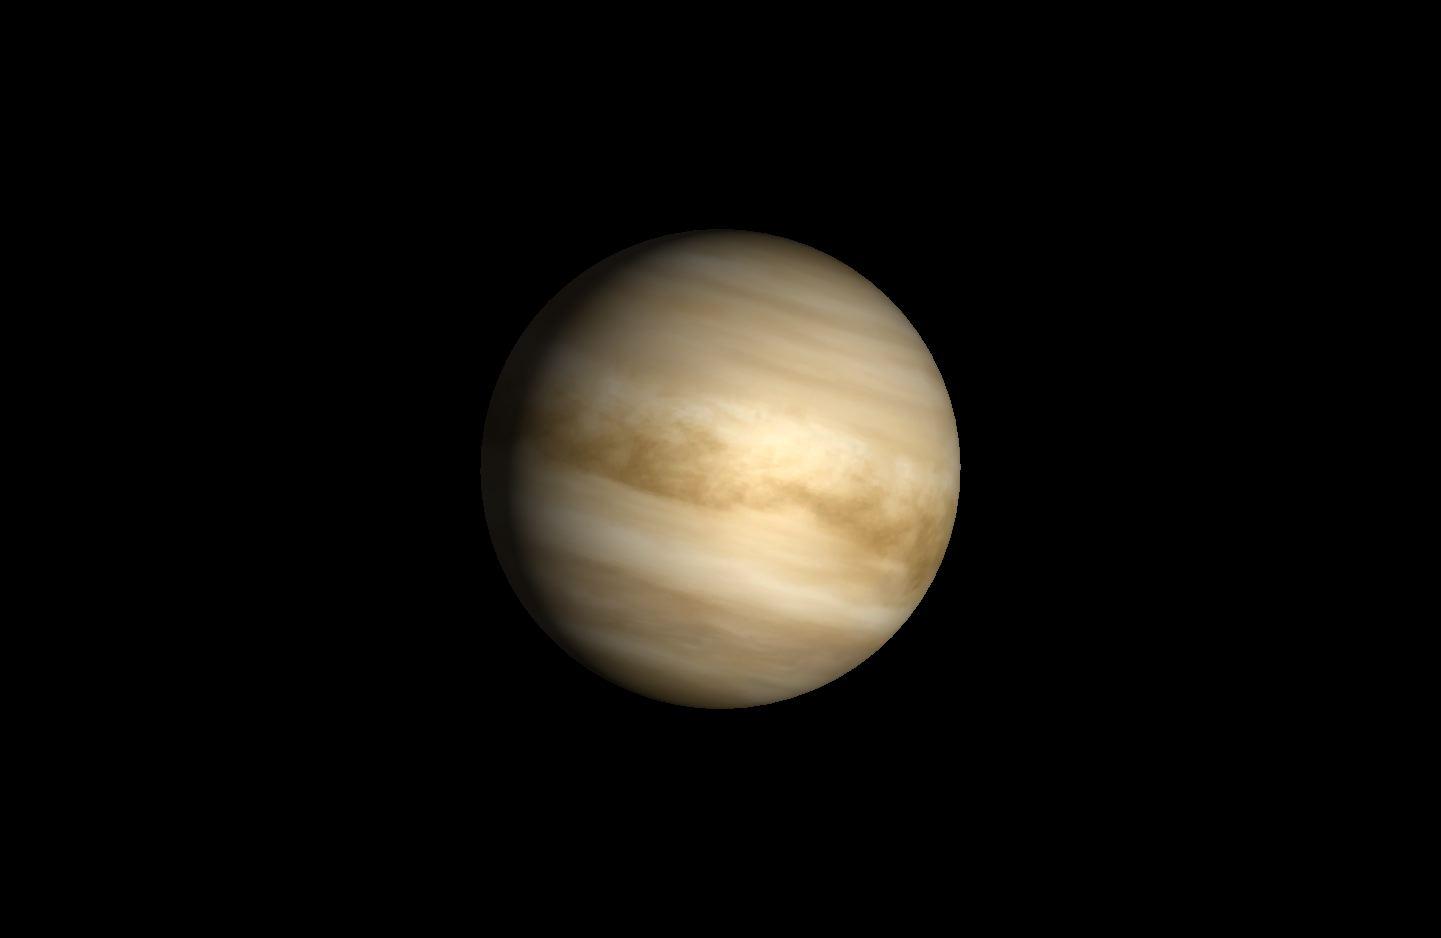 Venus voltagebd Image collections